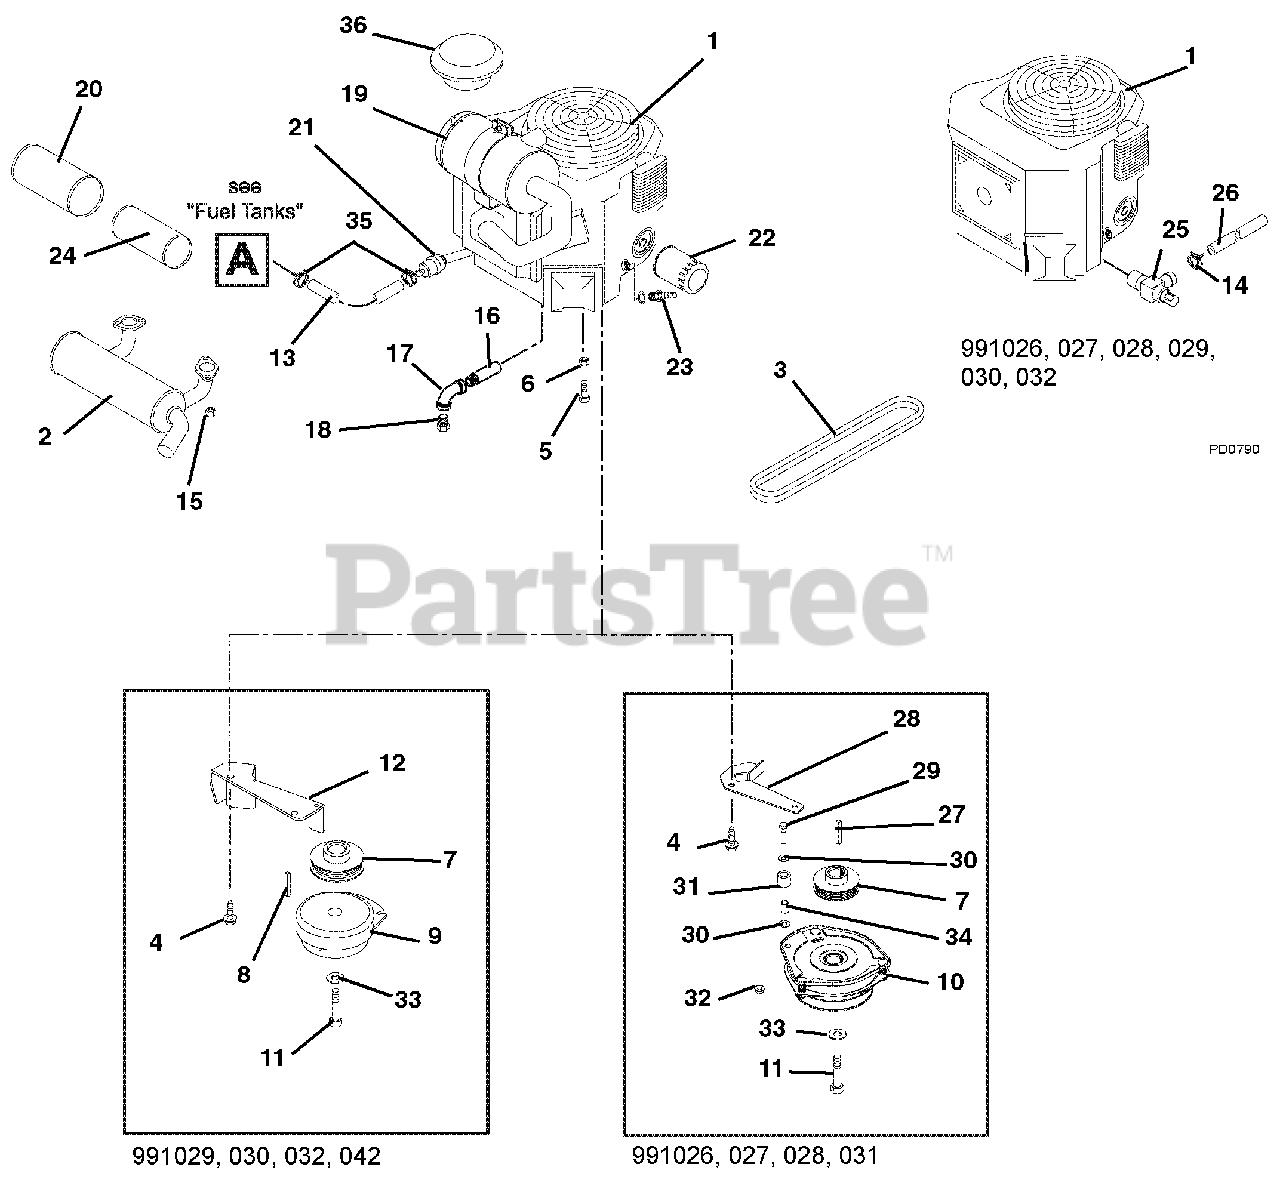 23 Hp Kawasaki Engine Parts Diagram Wiring Diagram Year Case A Year Case A Reteimpresesabina It